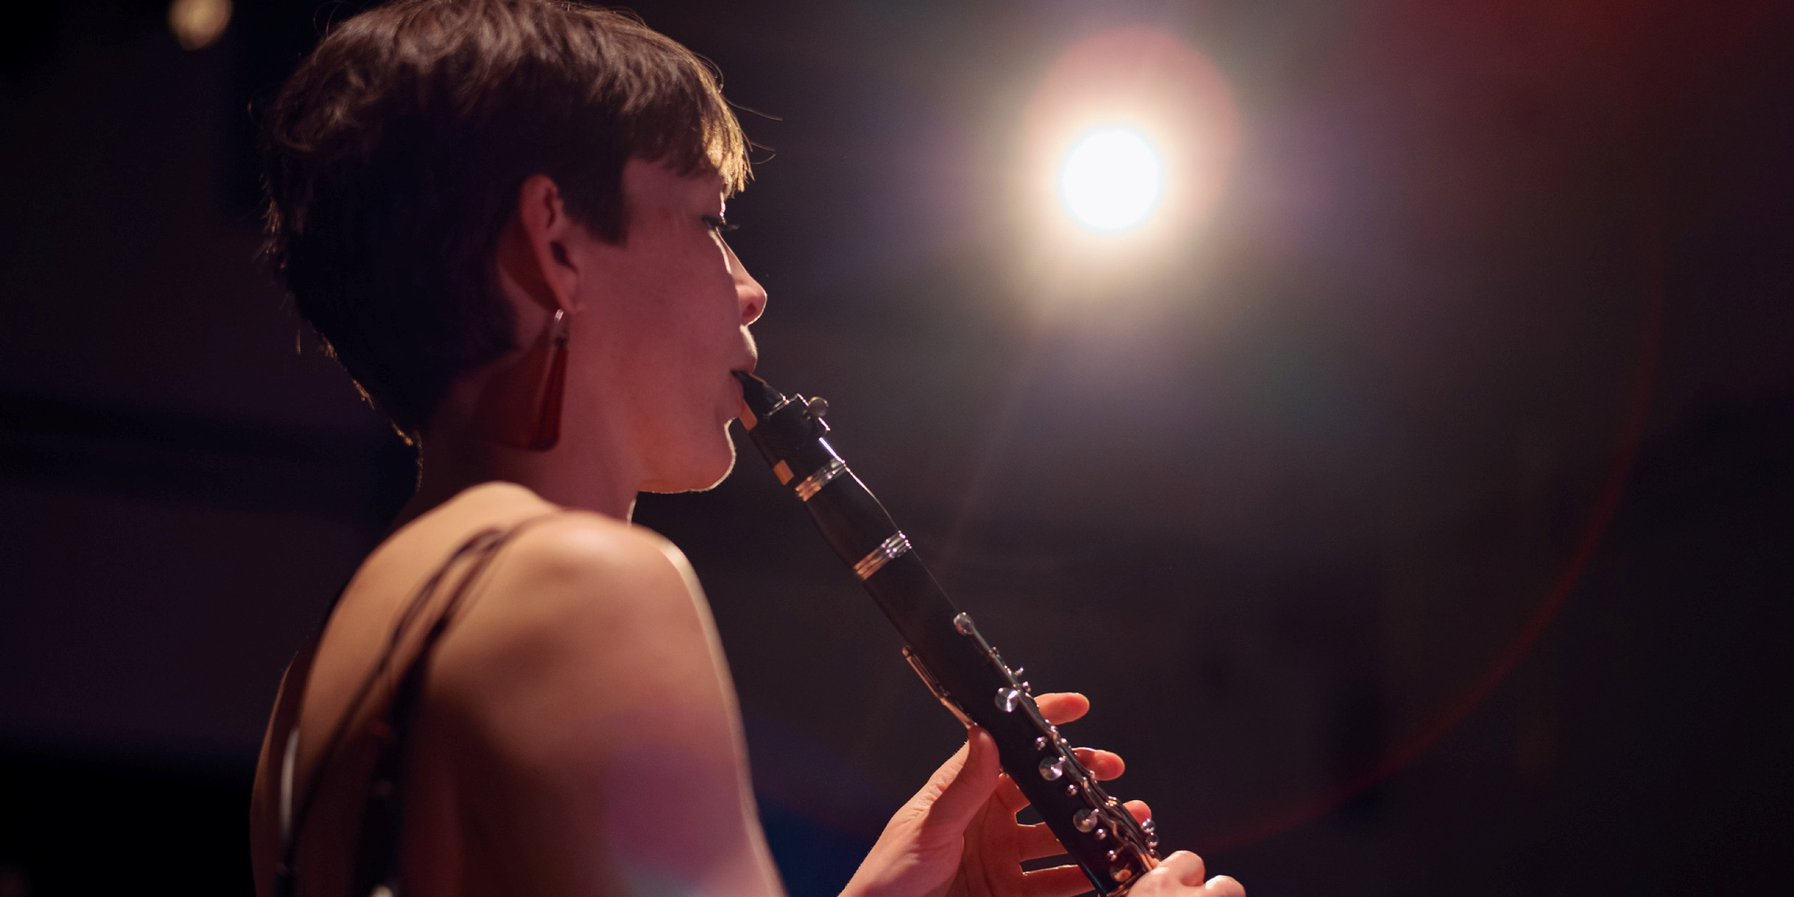 On the clarinet: Carola Schaal